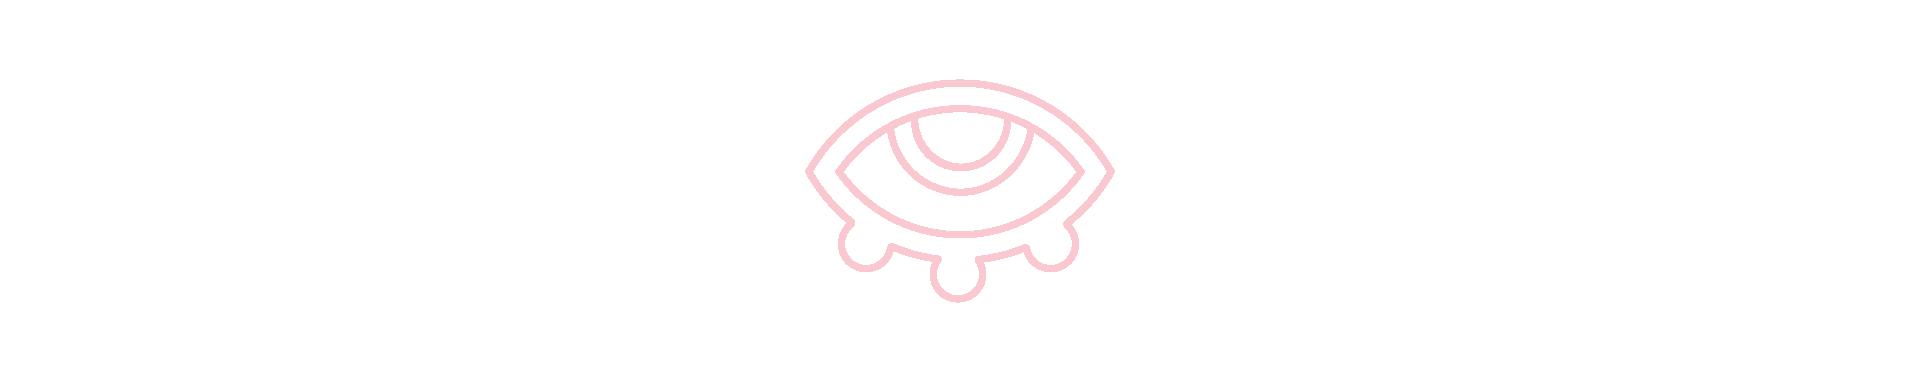 Clairy-LaurenceArtboard 1 copyEye-Logo-Pink.png